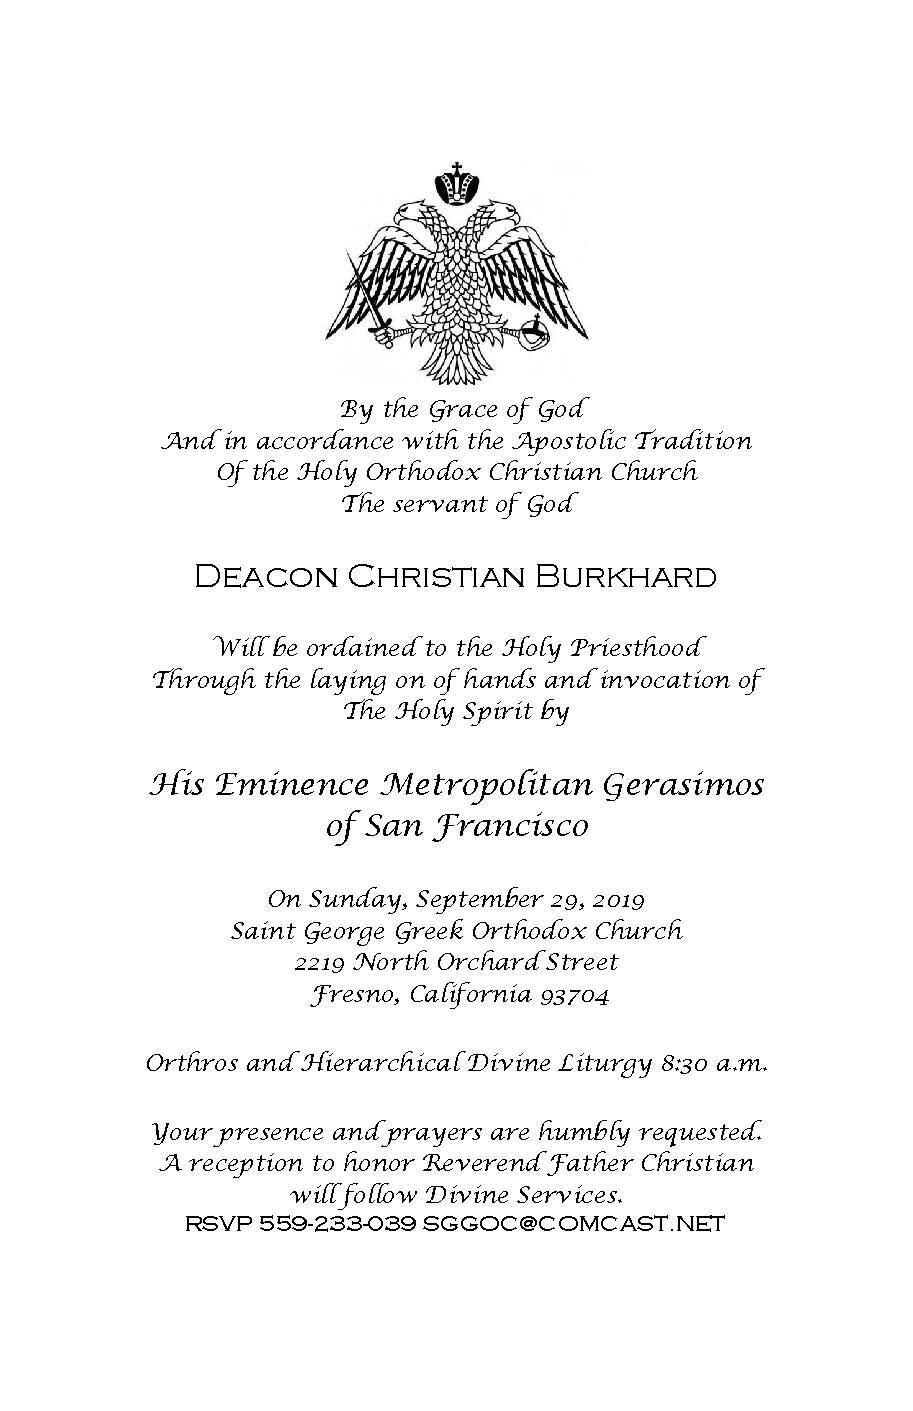 Burkhard Ordination to the Holy Priesthood_Page_1.jpg